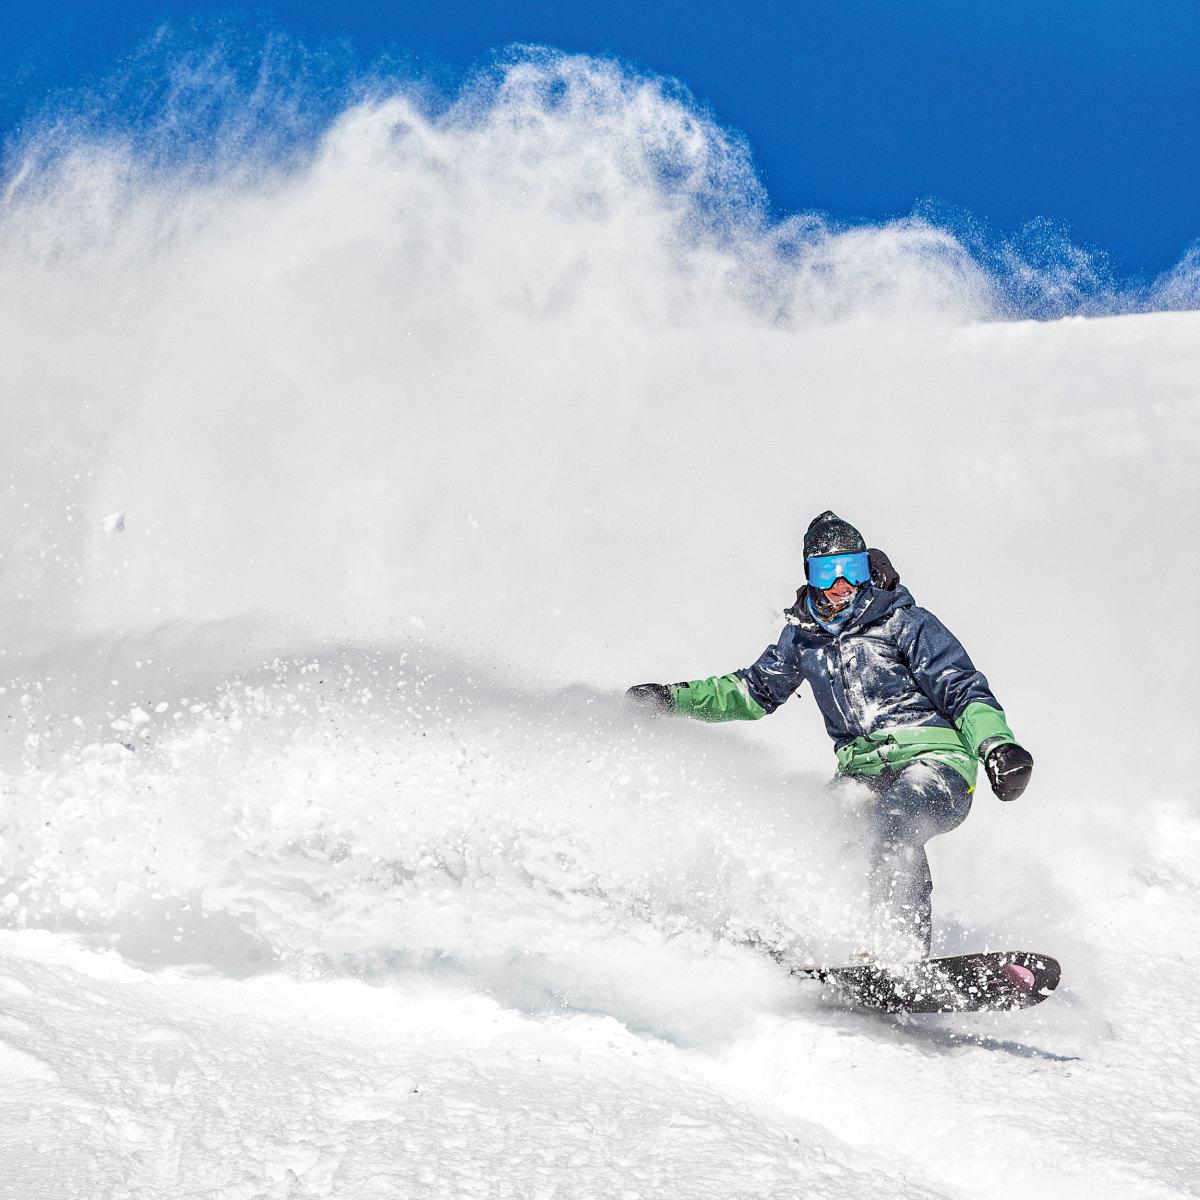 salomon pillow talk snowboard review best women s all mountain snowboards of 2019 good wood 2018 2019 transworld snowboarding